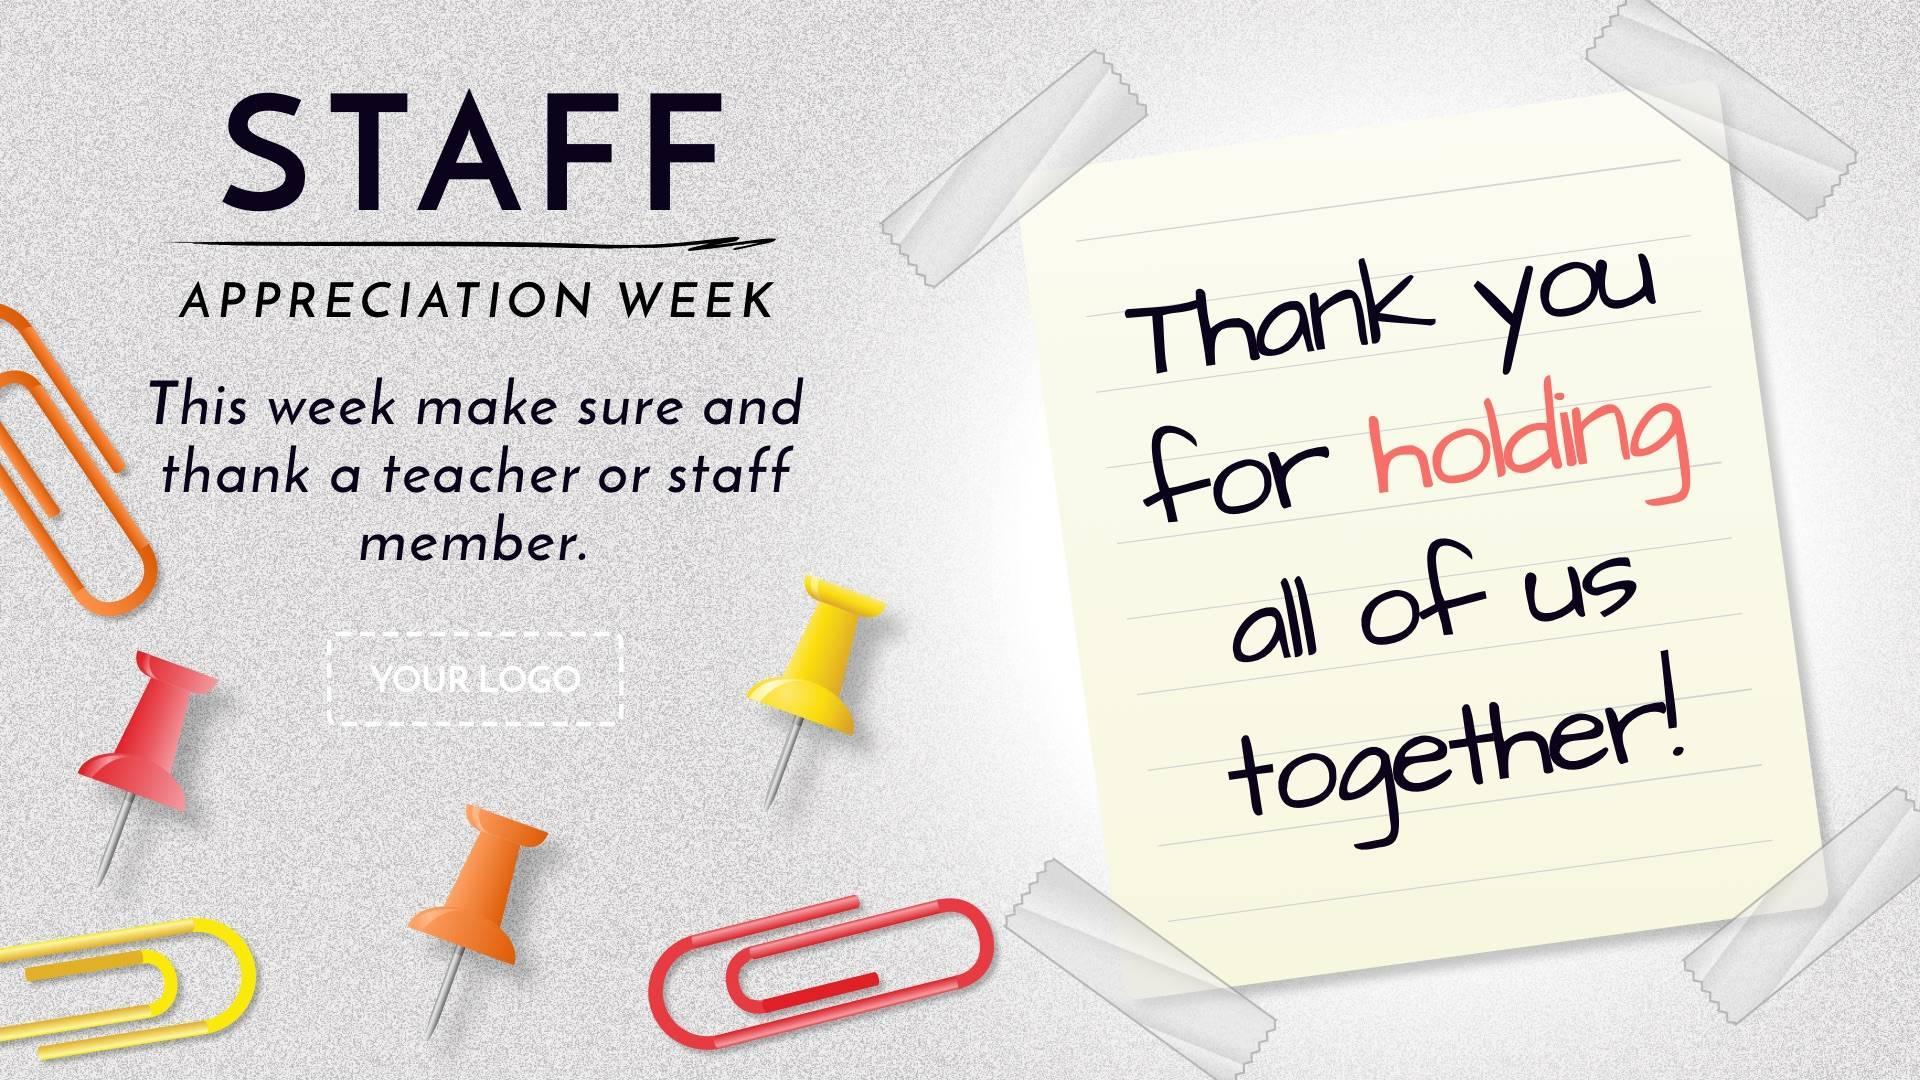 Staff Appreciation Week Digital Signage Template